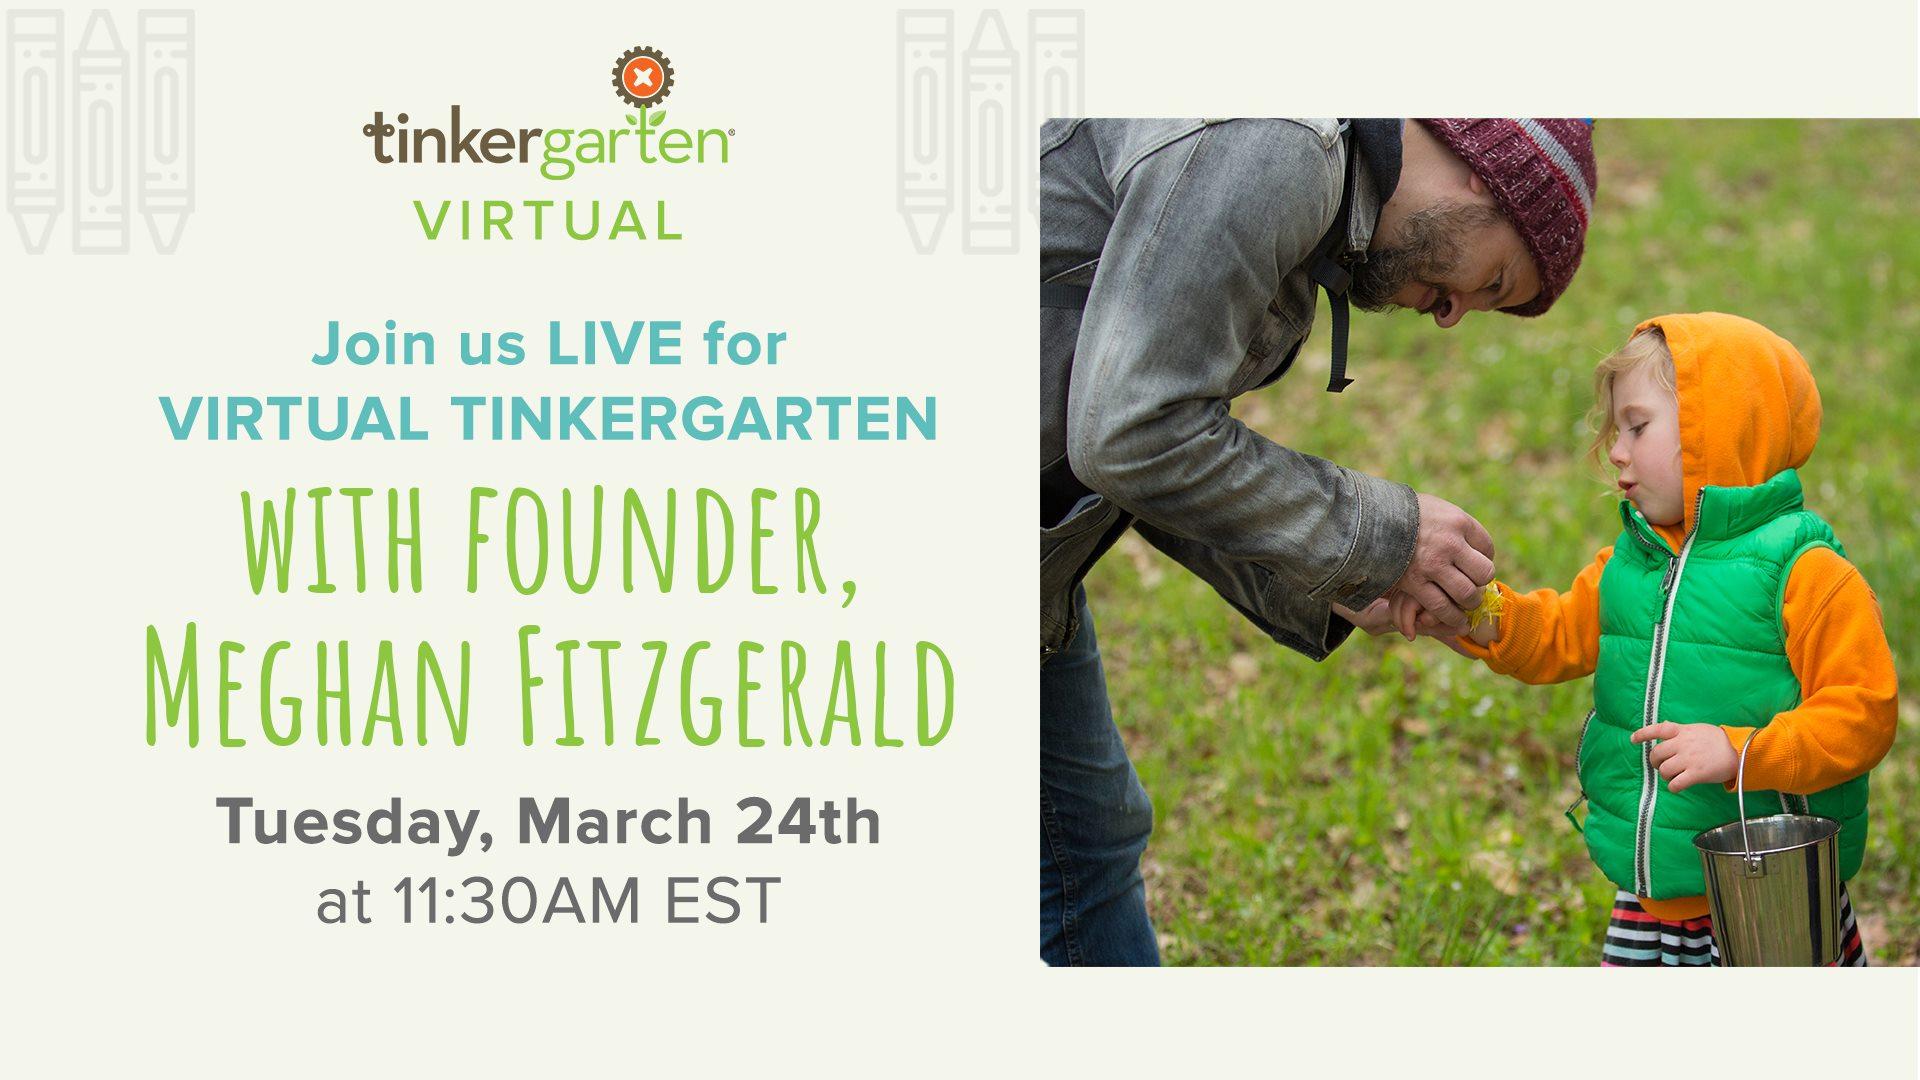 Virtual Tinkergarten